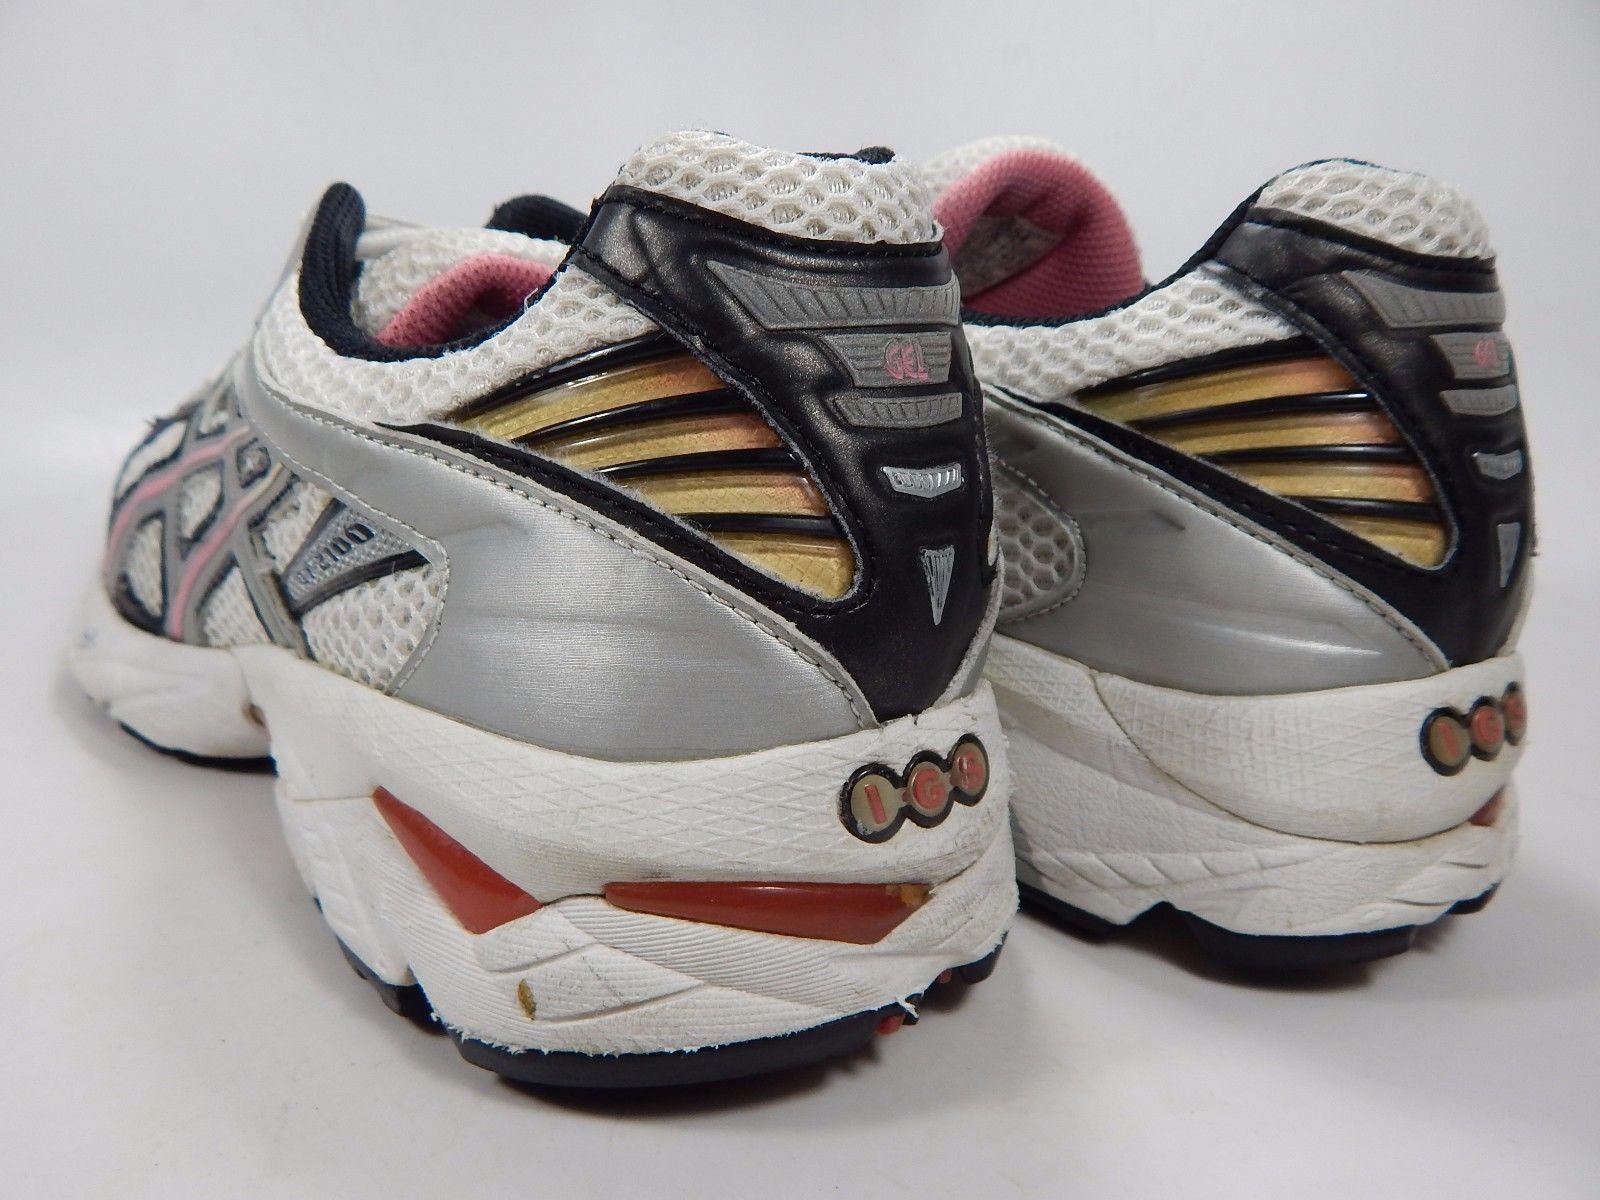 Asics GT 2100 Women's Running Shoes Size US 11 M (B) EU 43.5 White Silver TN554